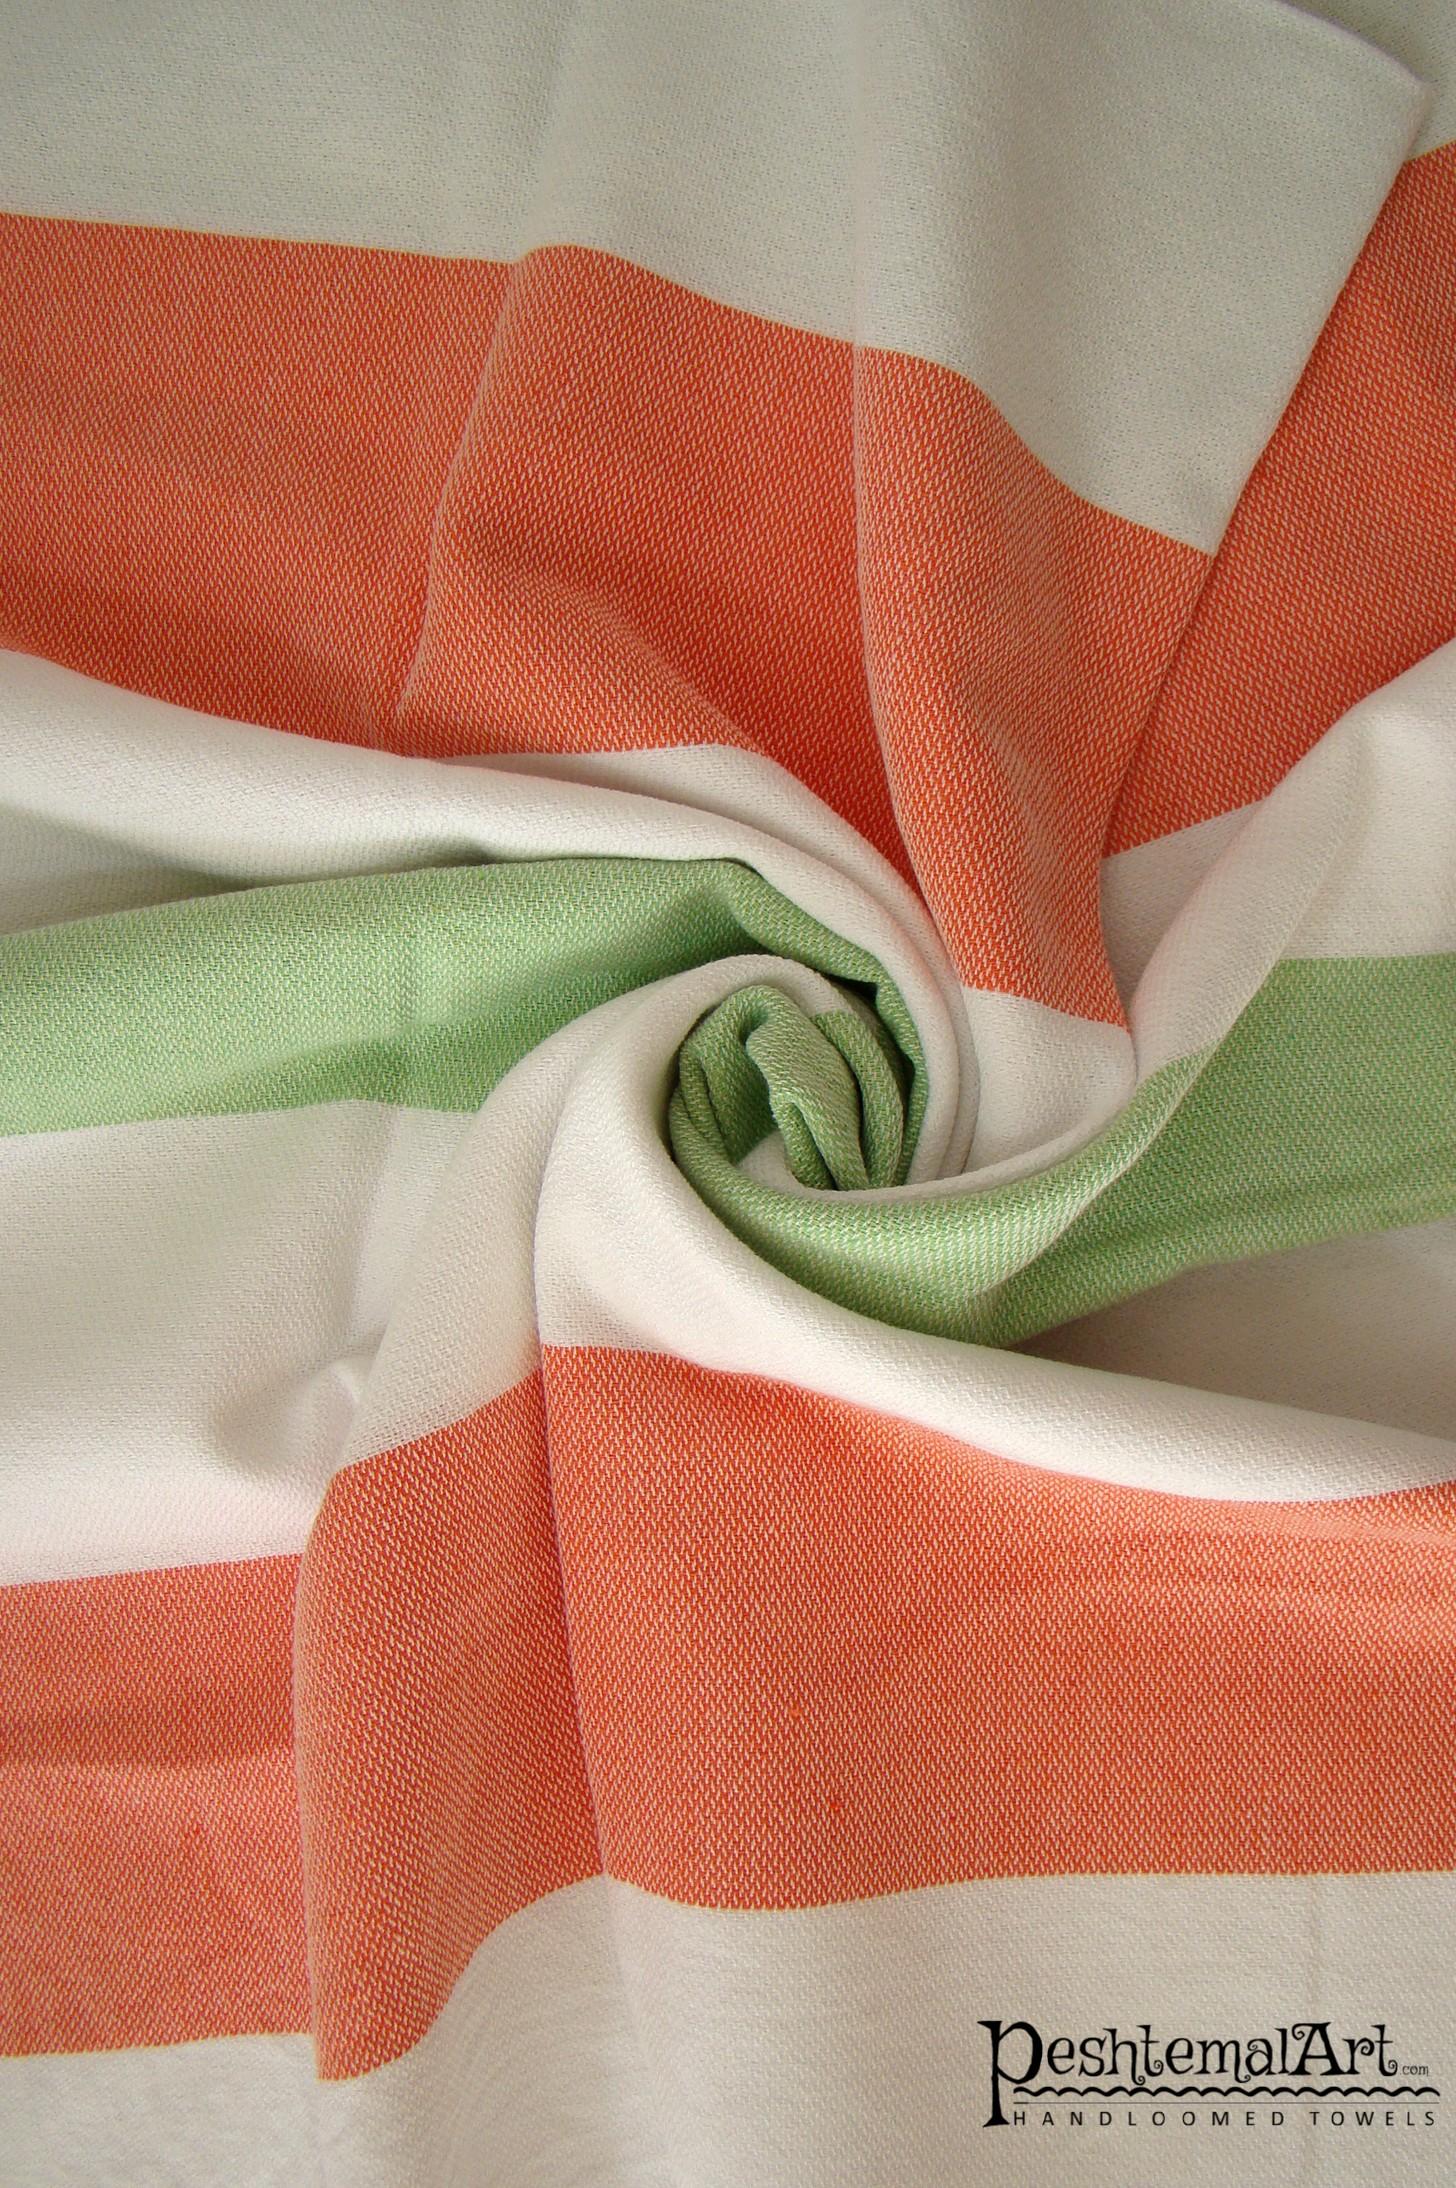 Metropol Beach Towel - Green, Orange, White